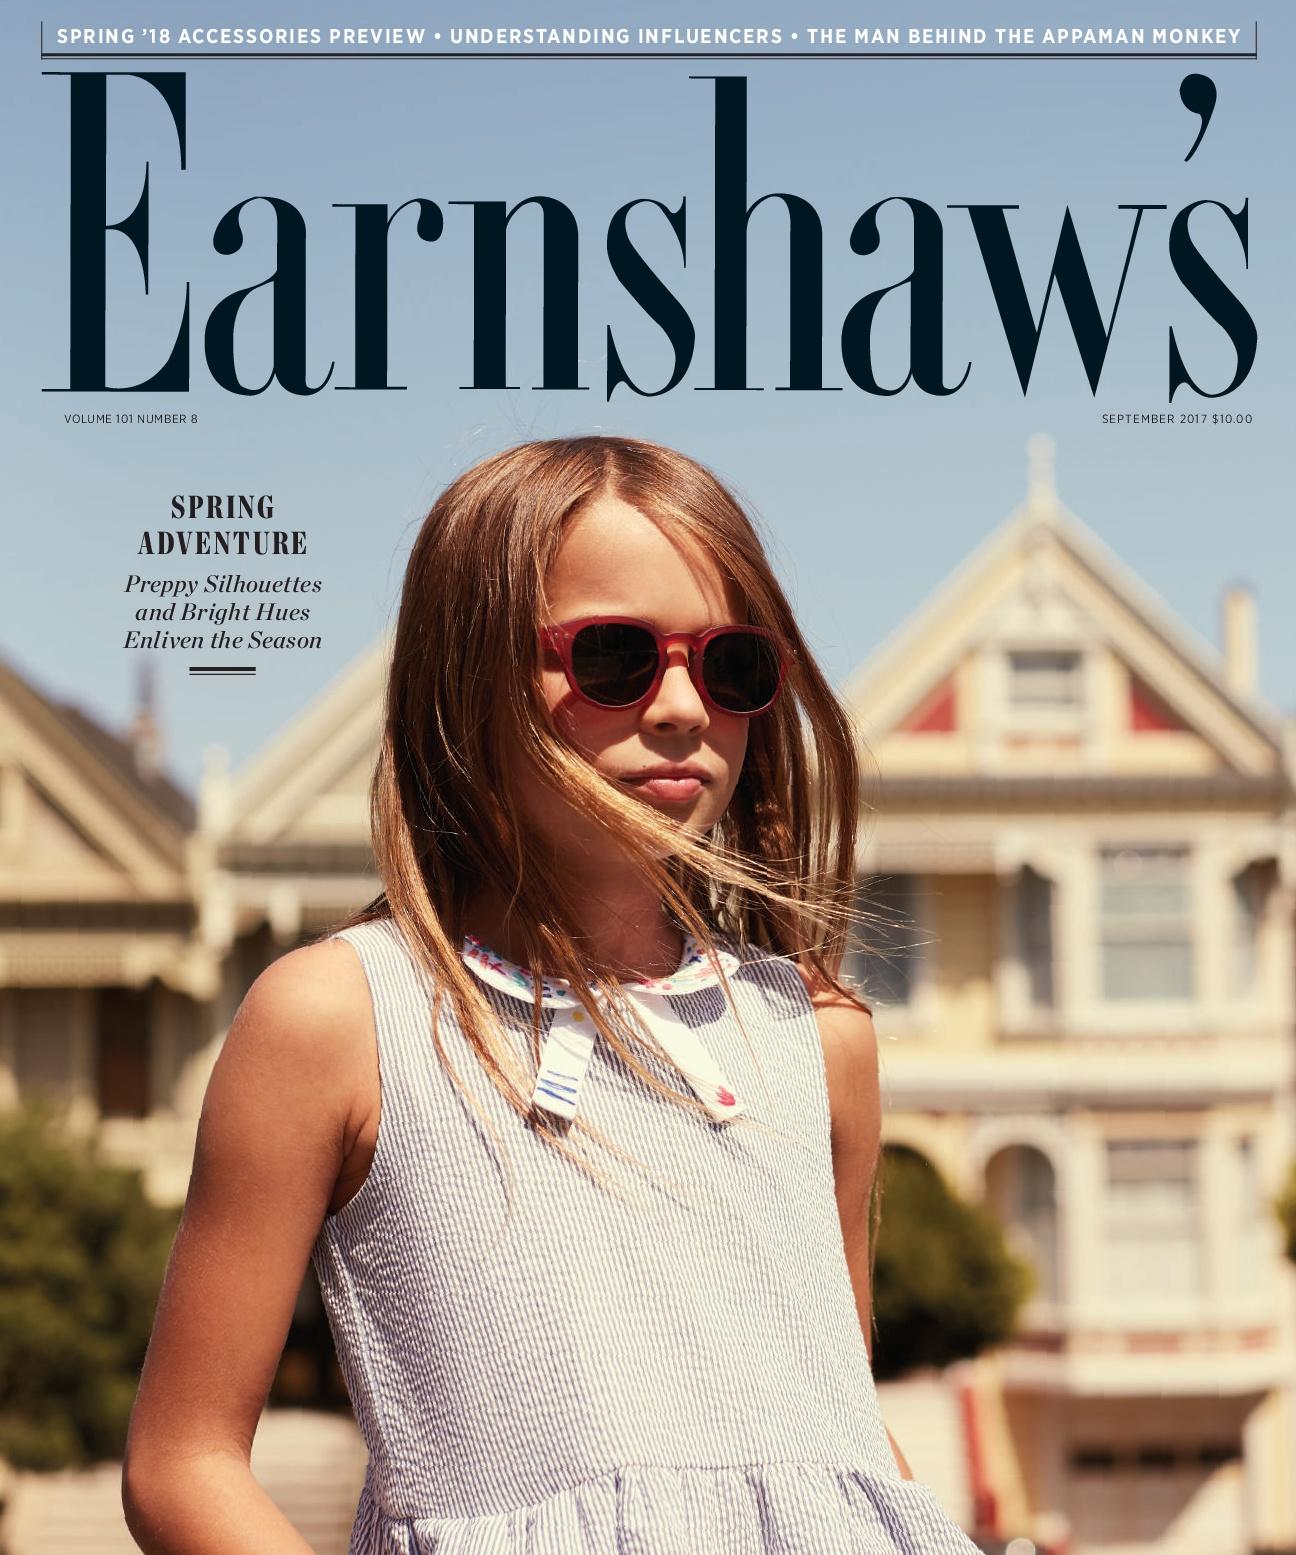 EarnshawsSeptember2017-001